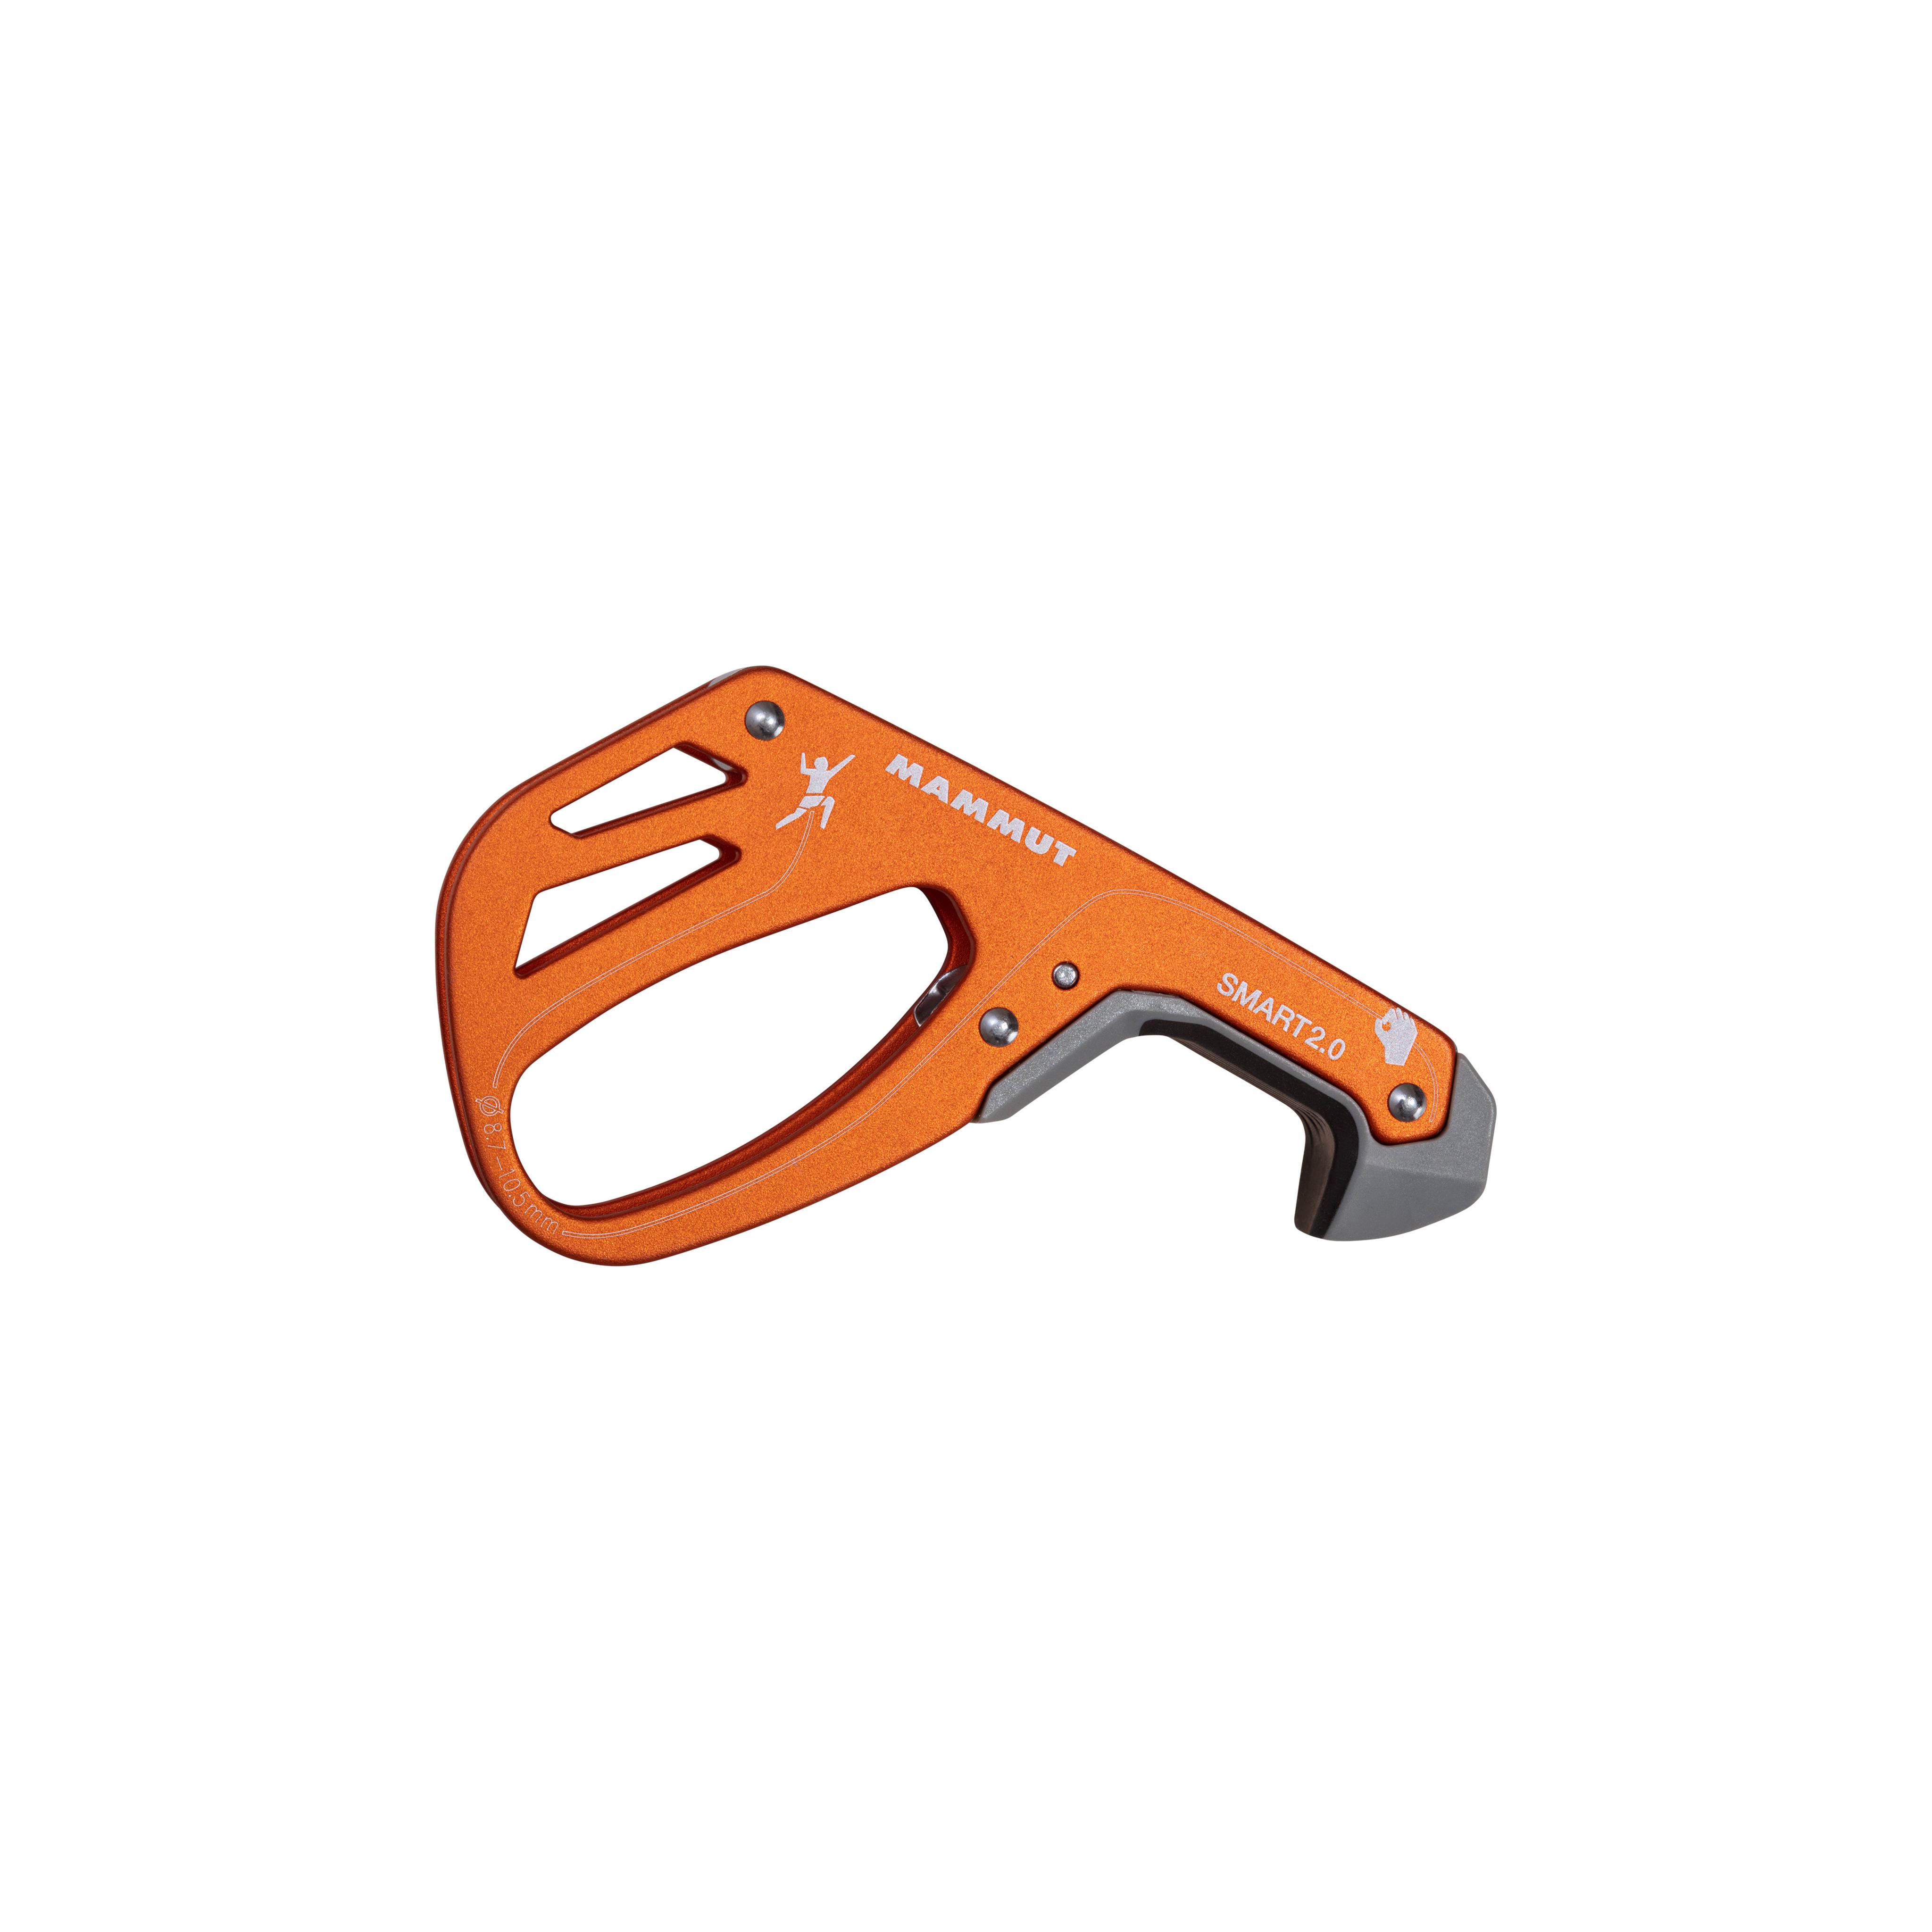 Smart 2.0 - dark orange, one size thumbnail